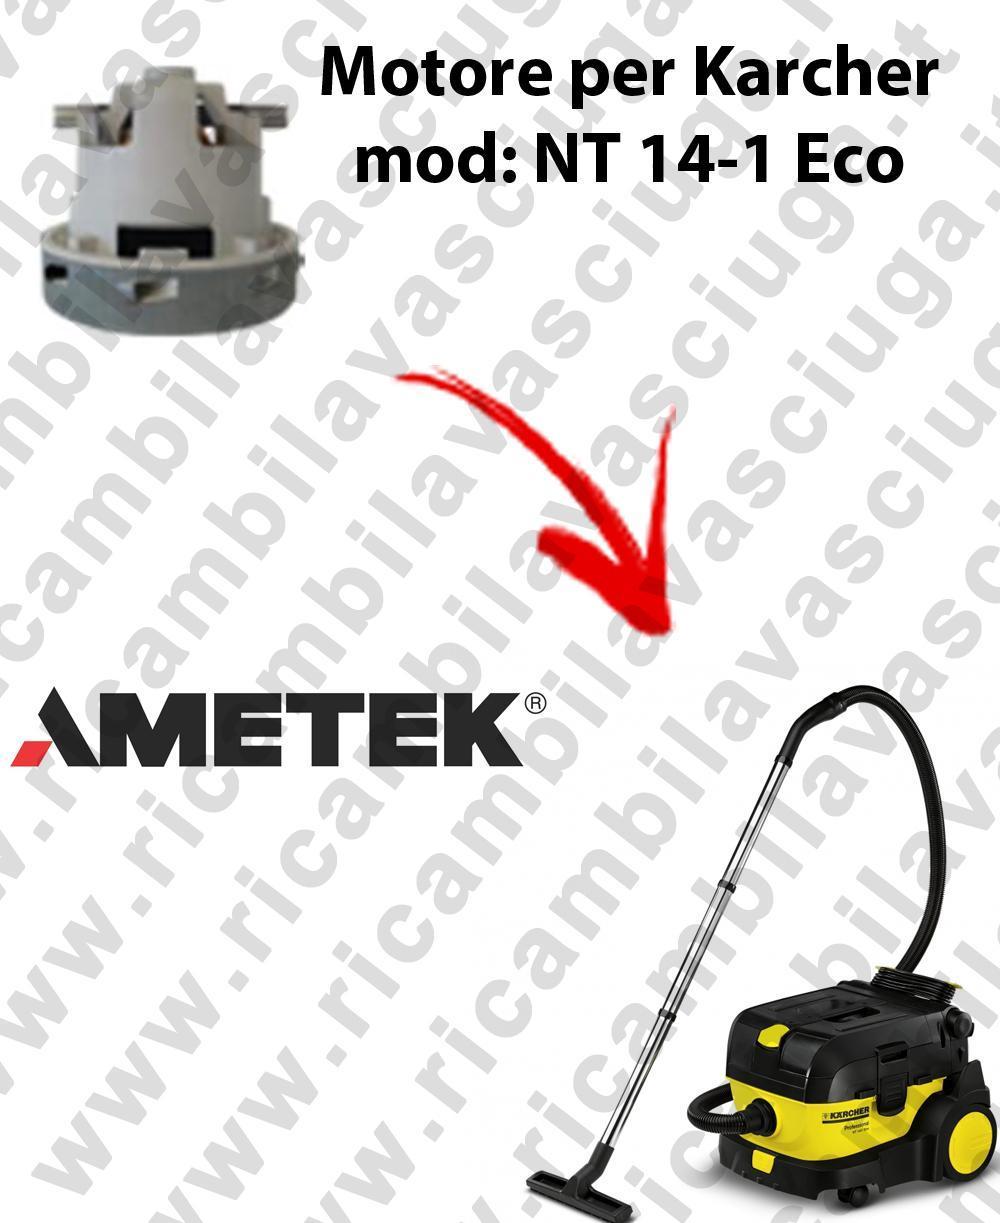 NT 14-1 Eco  Ametek Vacuum Motor for vacuum cleaner KERCHER